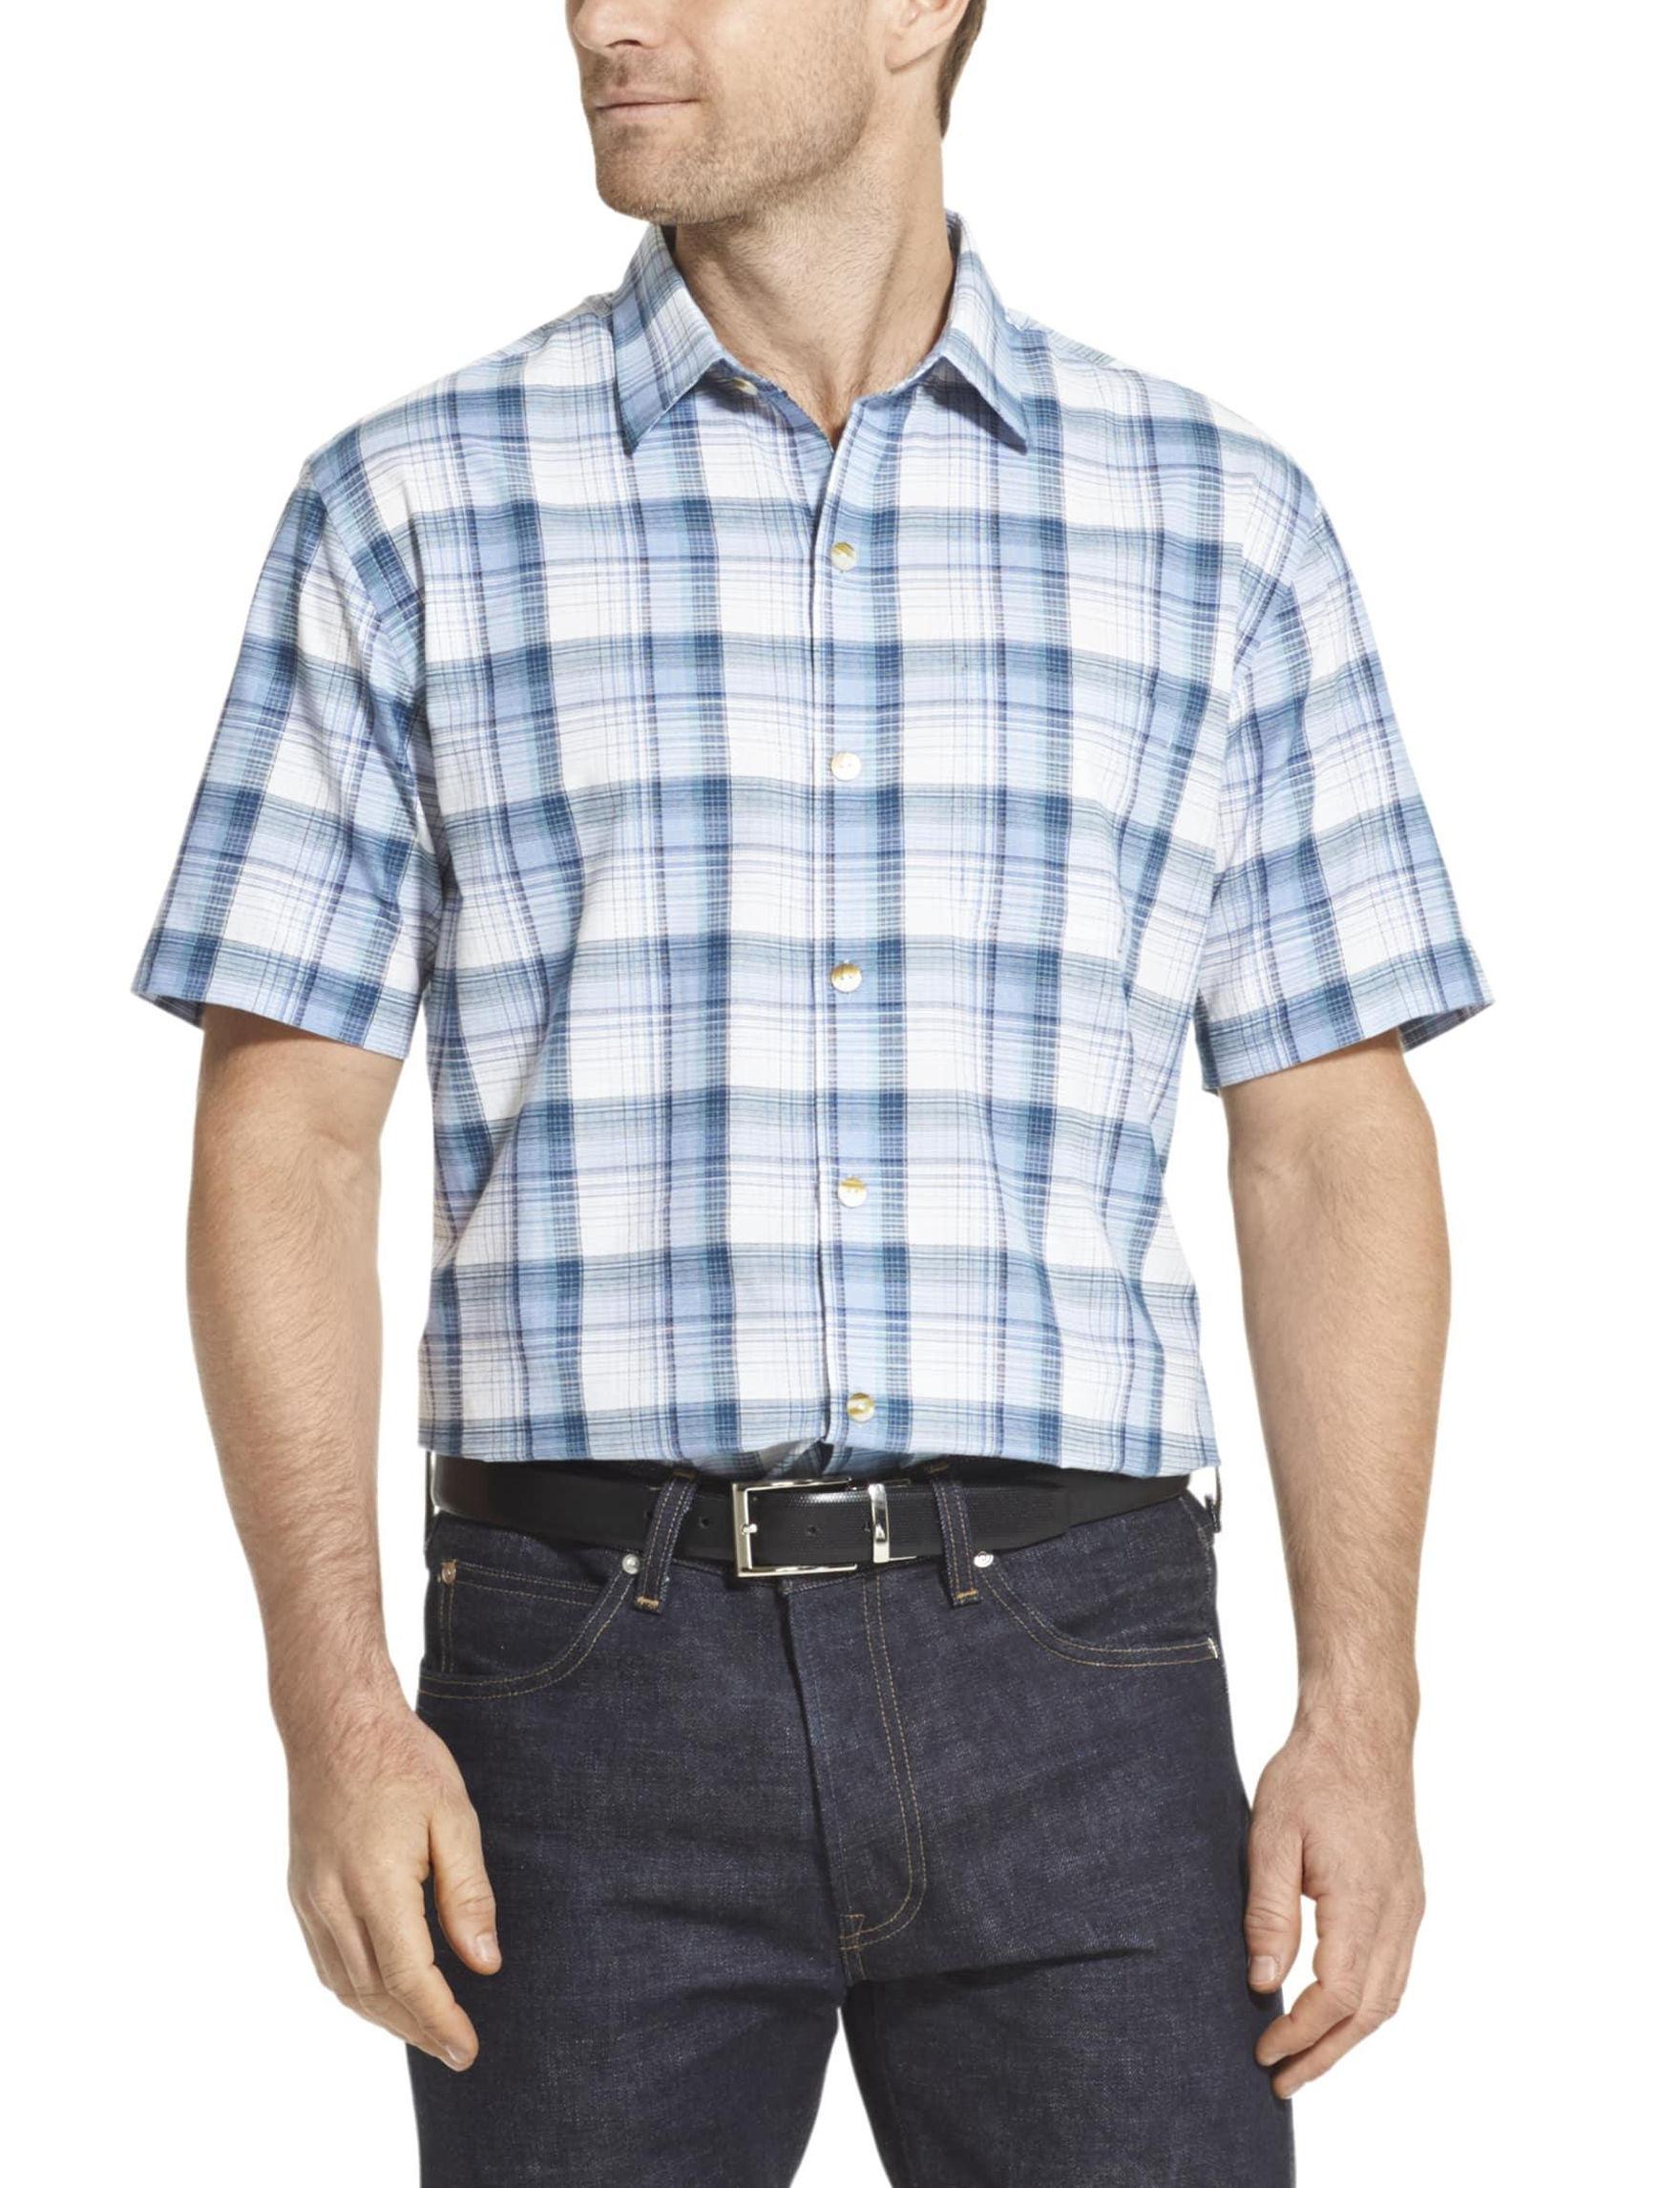 Van Heusen Blue Colony Casual Button Down Shirts